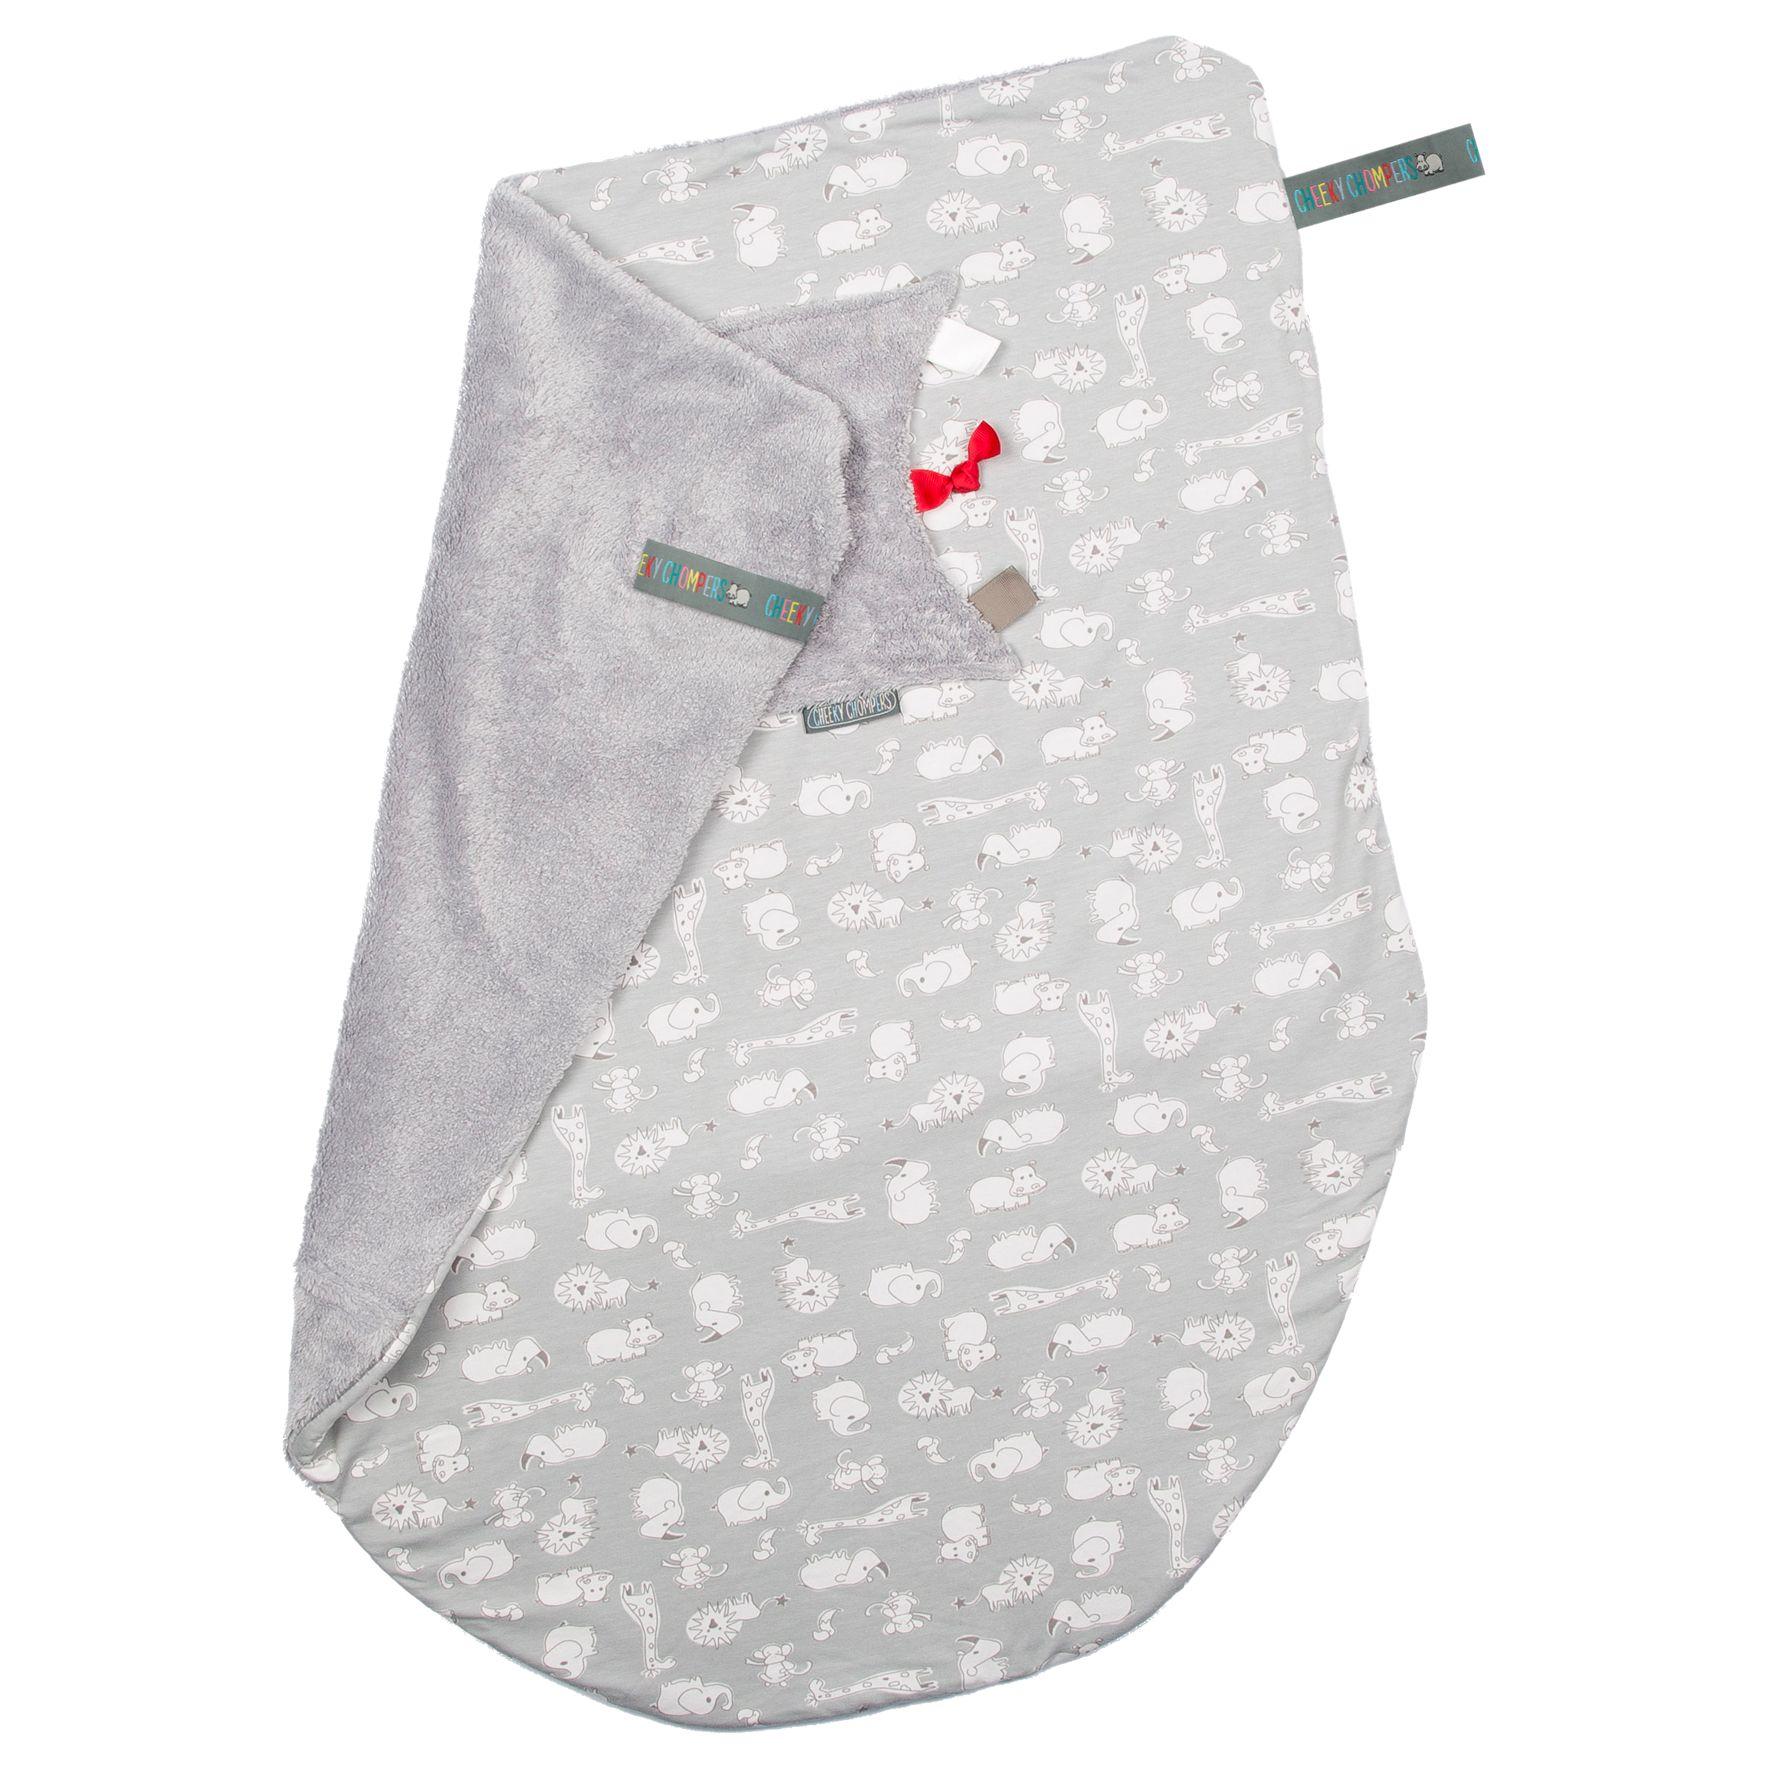 Cheeky Chompers Cheeky Chompers Baby Safari Blanket, Grey/White